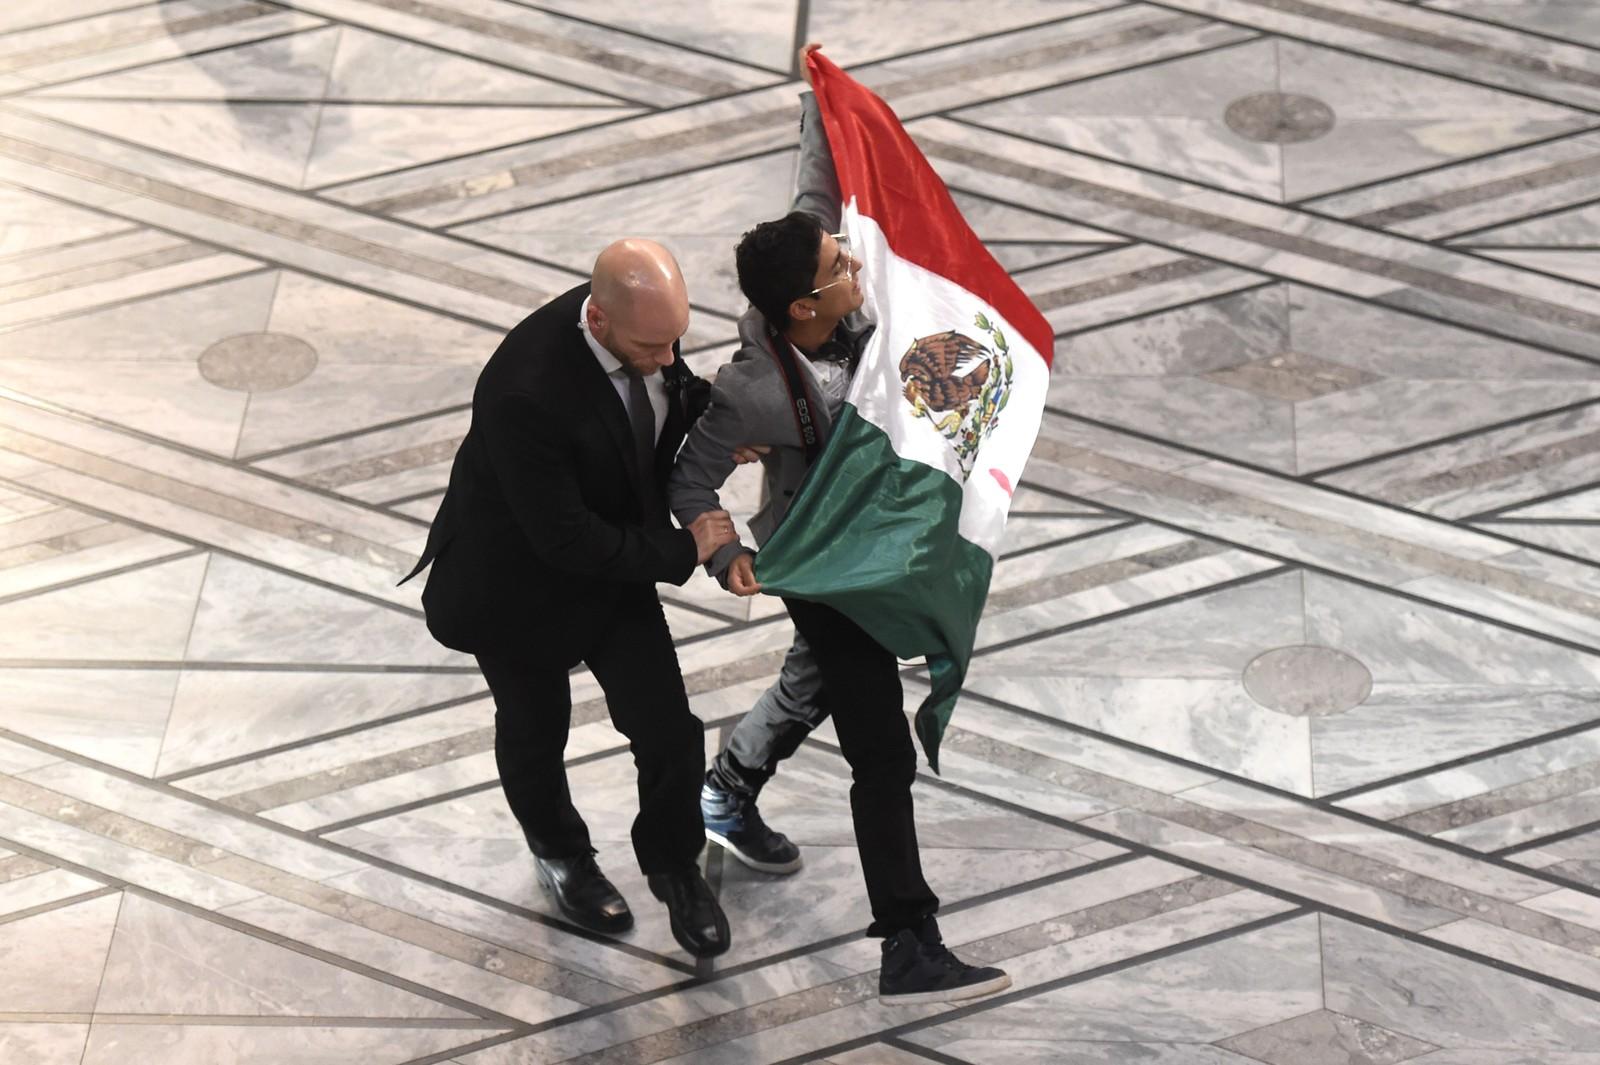 MEXICANSK FLAGG: Mannen hadde kamera rundt halsen og bar på et mexicansk flagg.